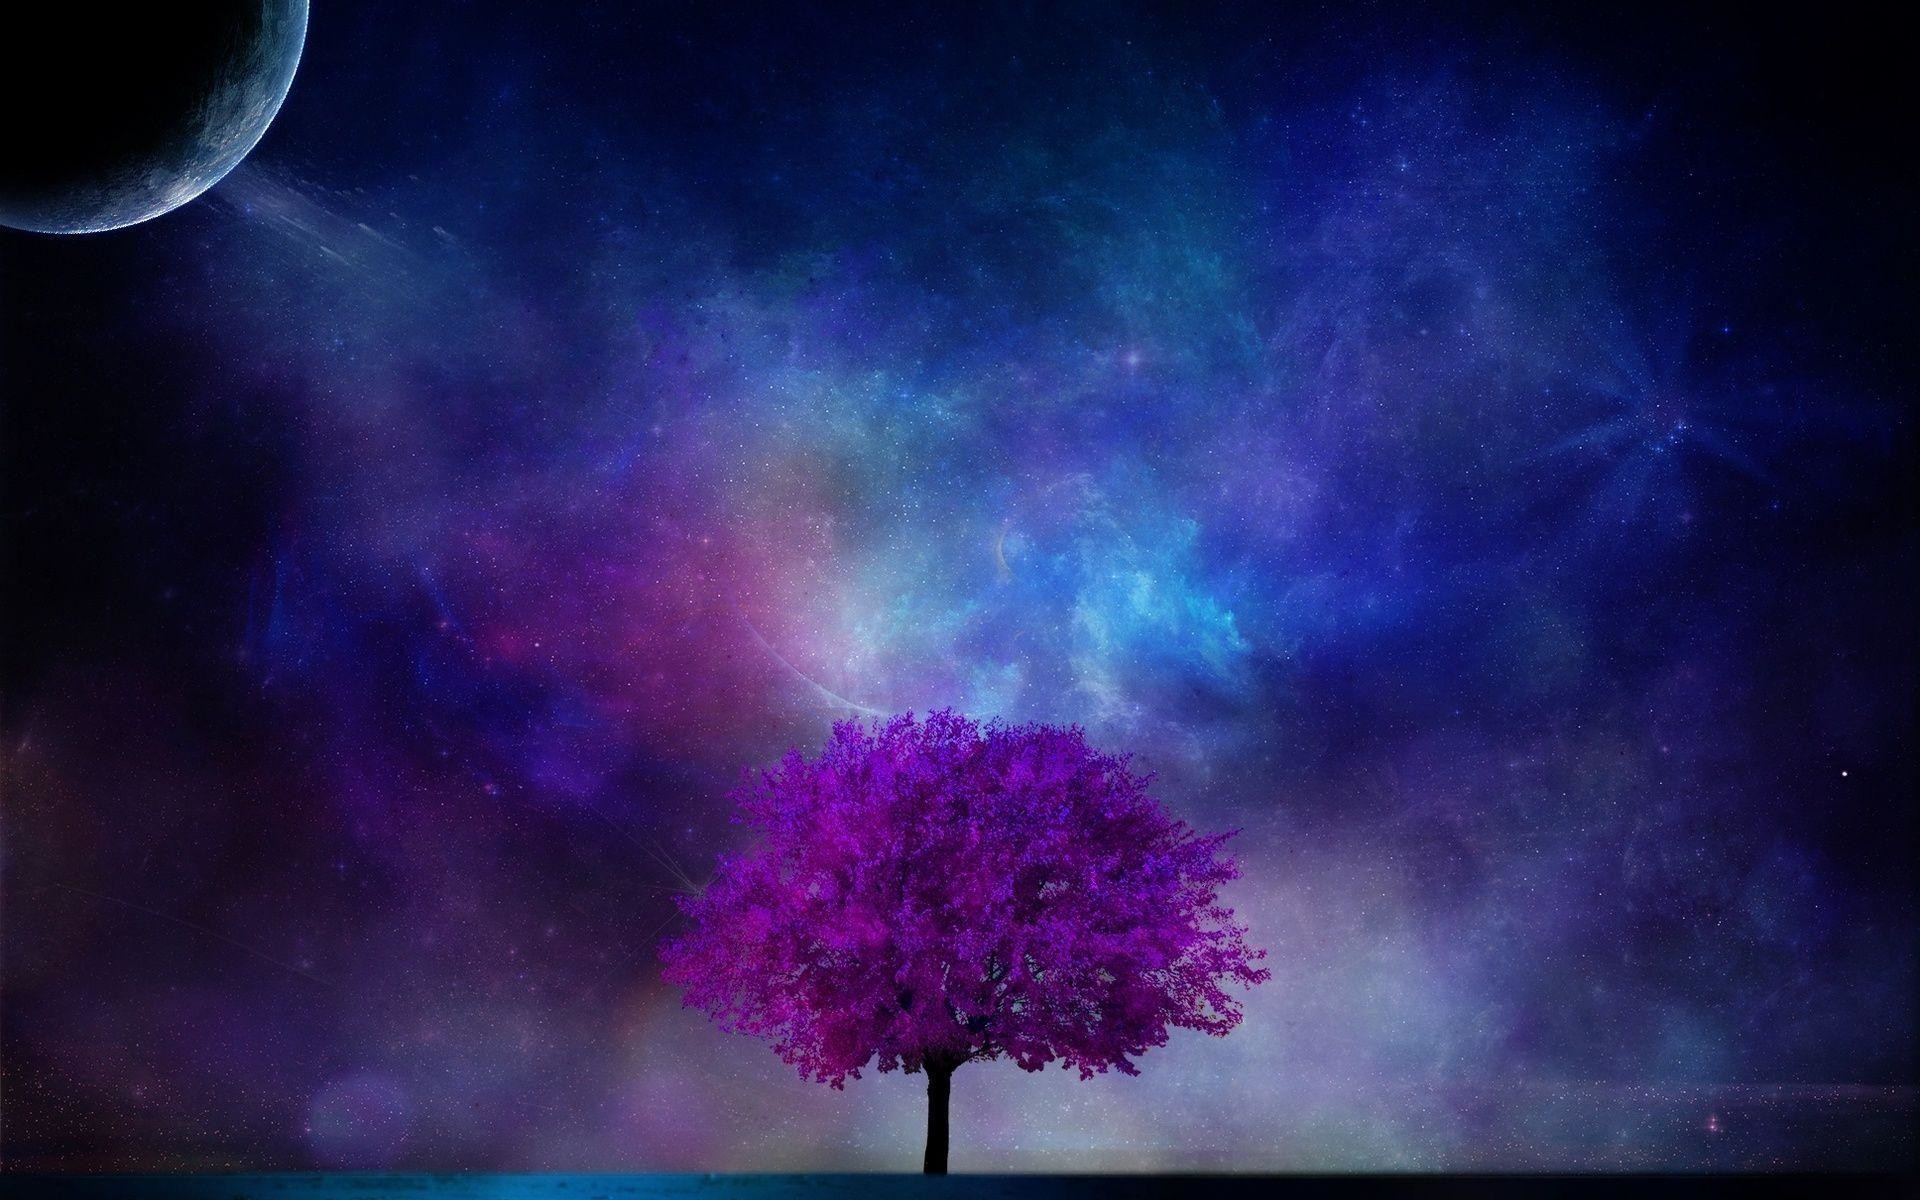 Art Nebula Sky Sci Fi Planet Moon Stars Blossom Wallpaper Background